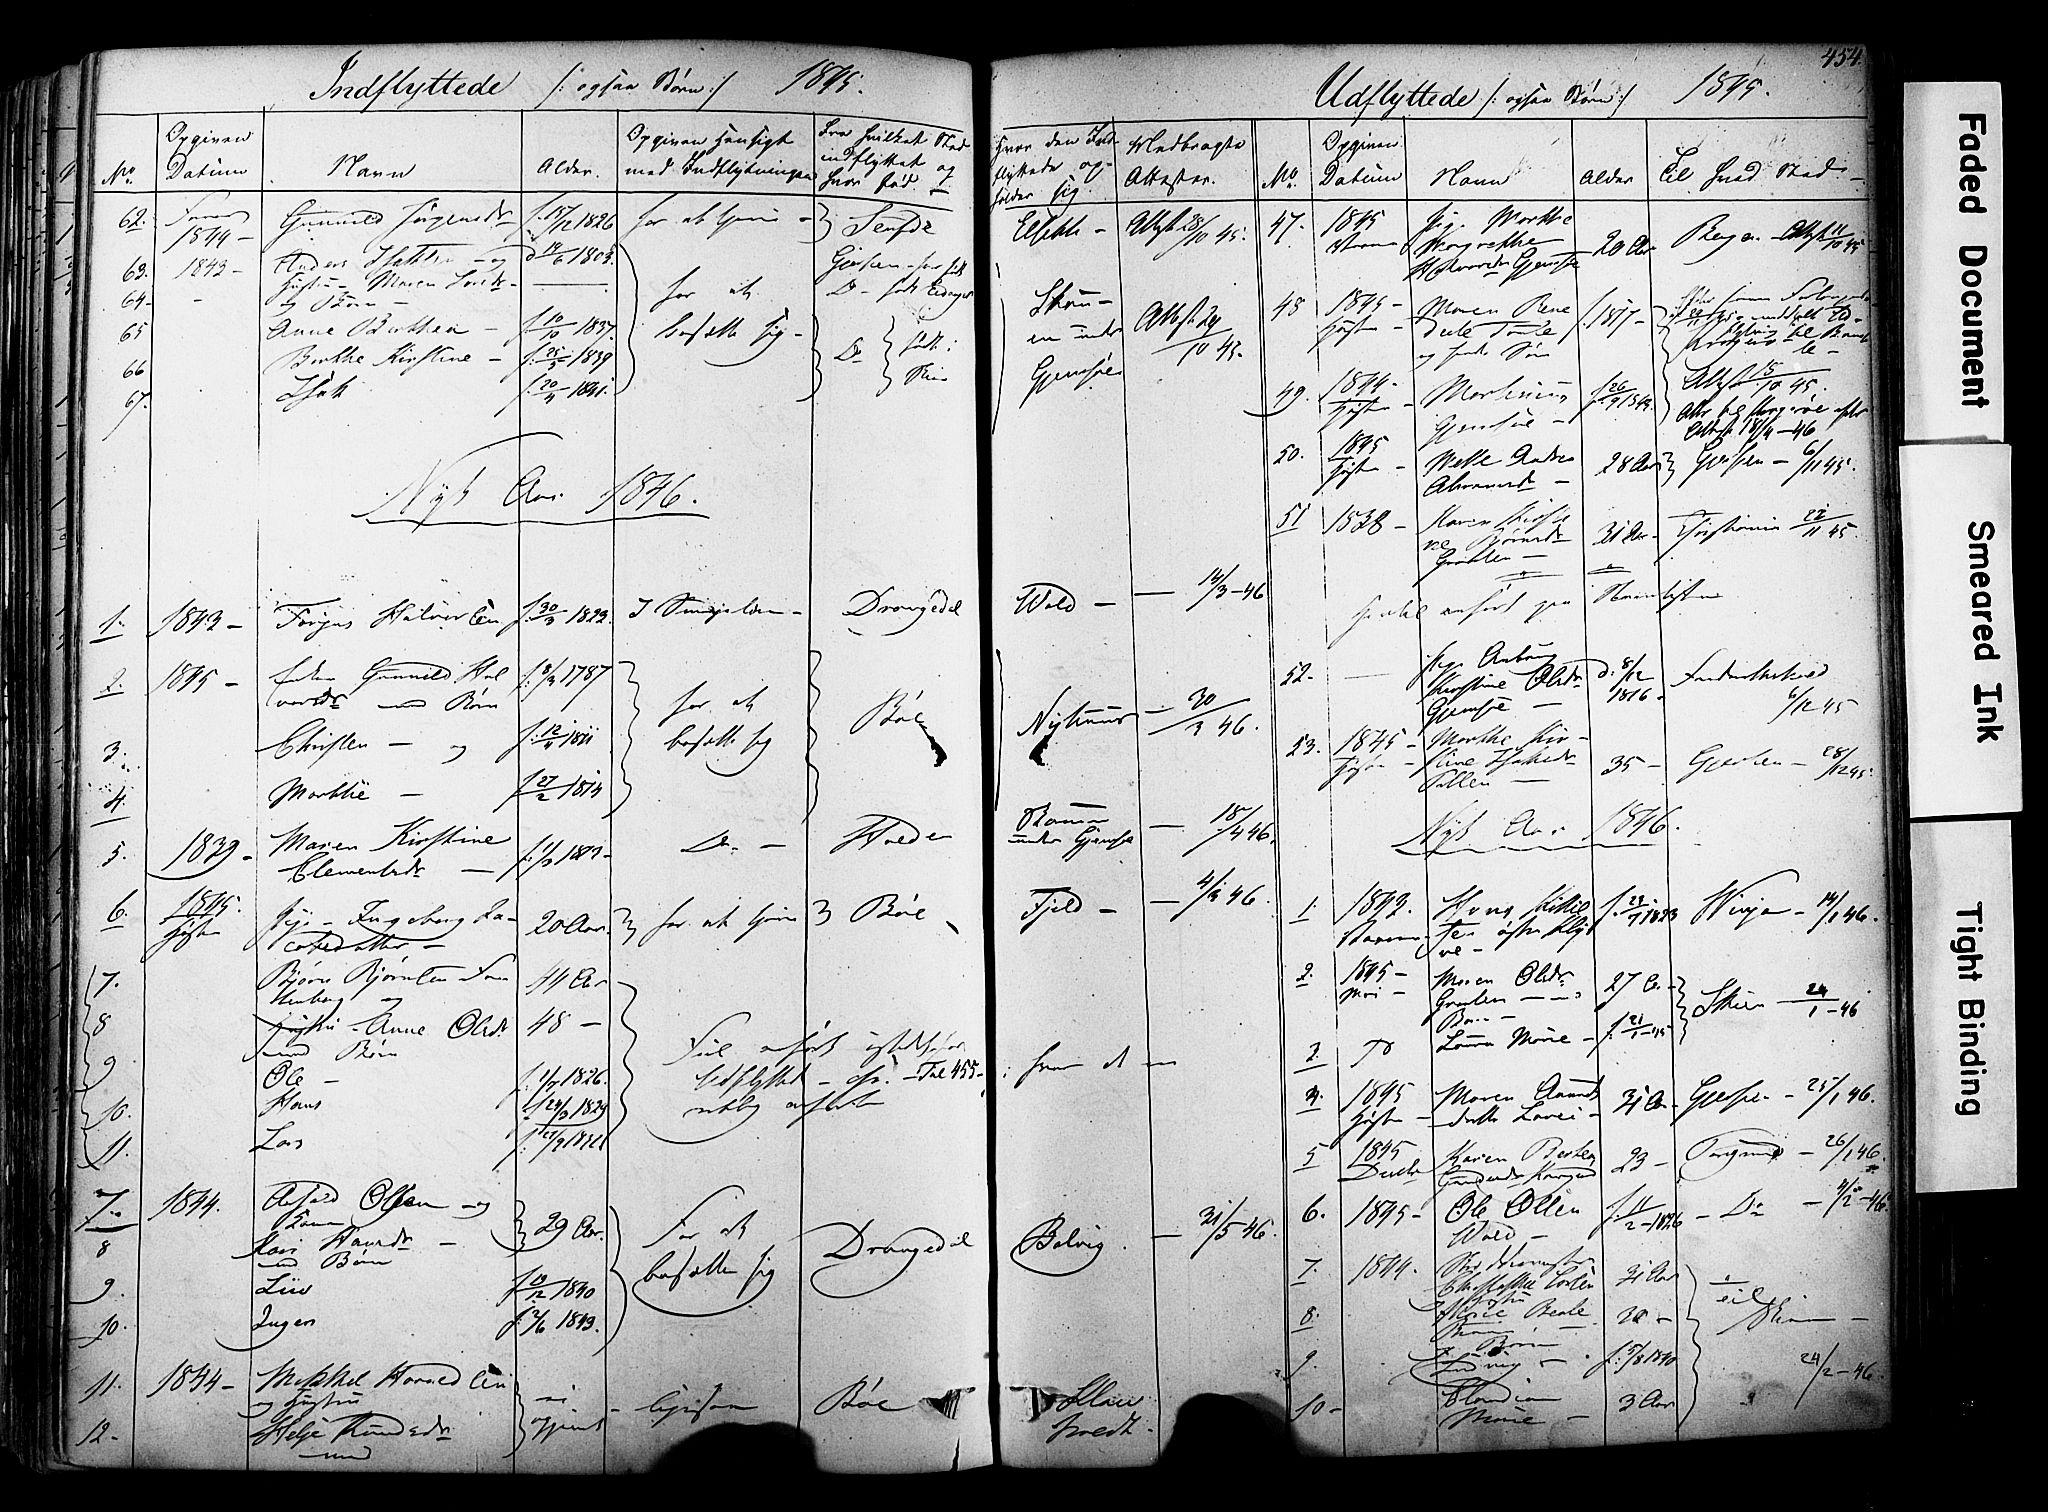 SAKO, Solum kirkebøker, F/Fa/L0006: Ministerialbok nr. I 6, 1844-1855, s. 454